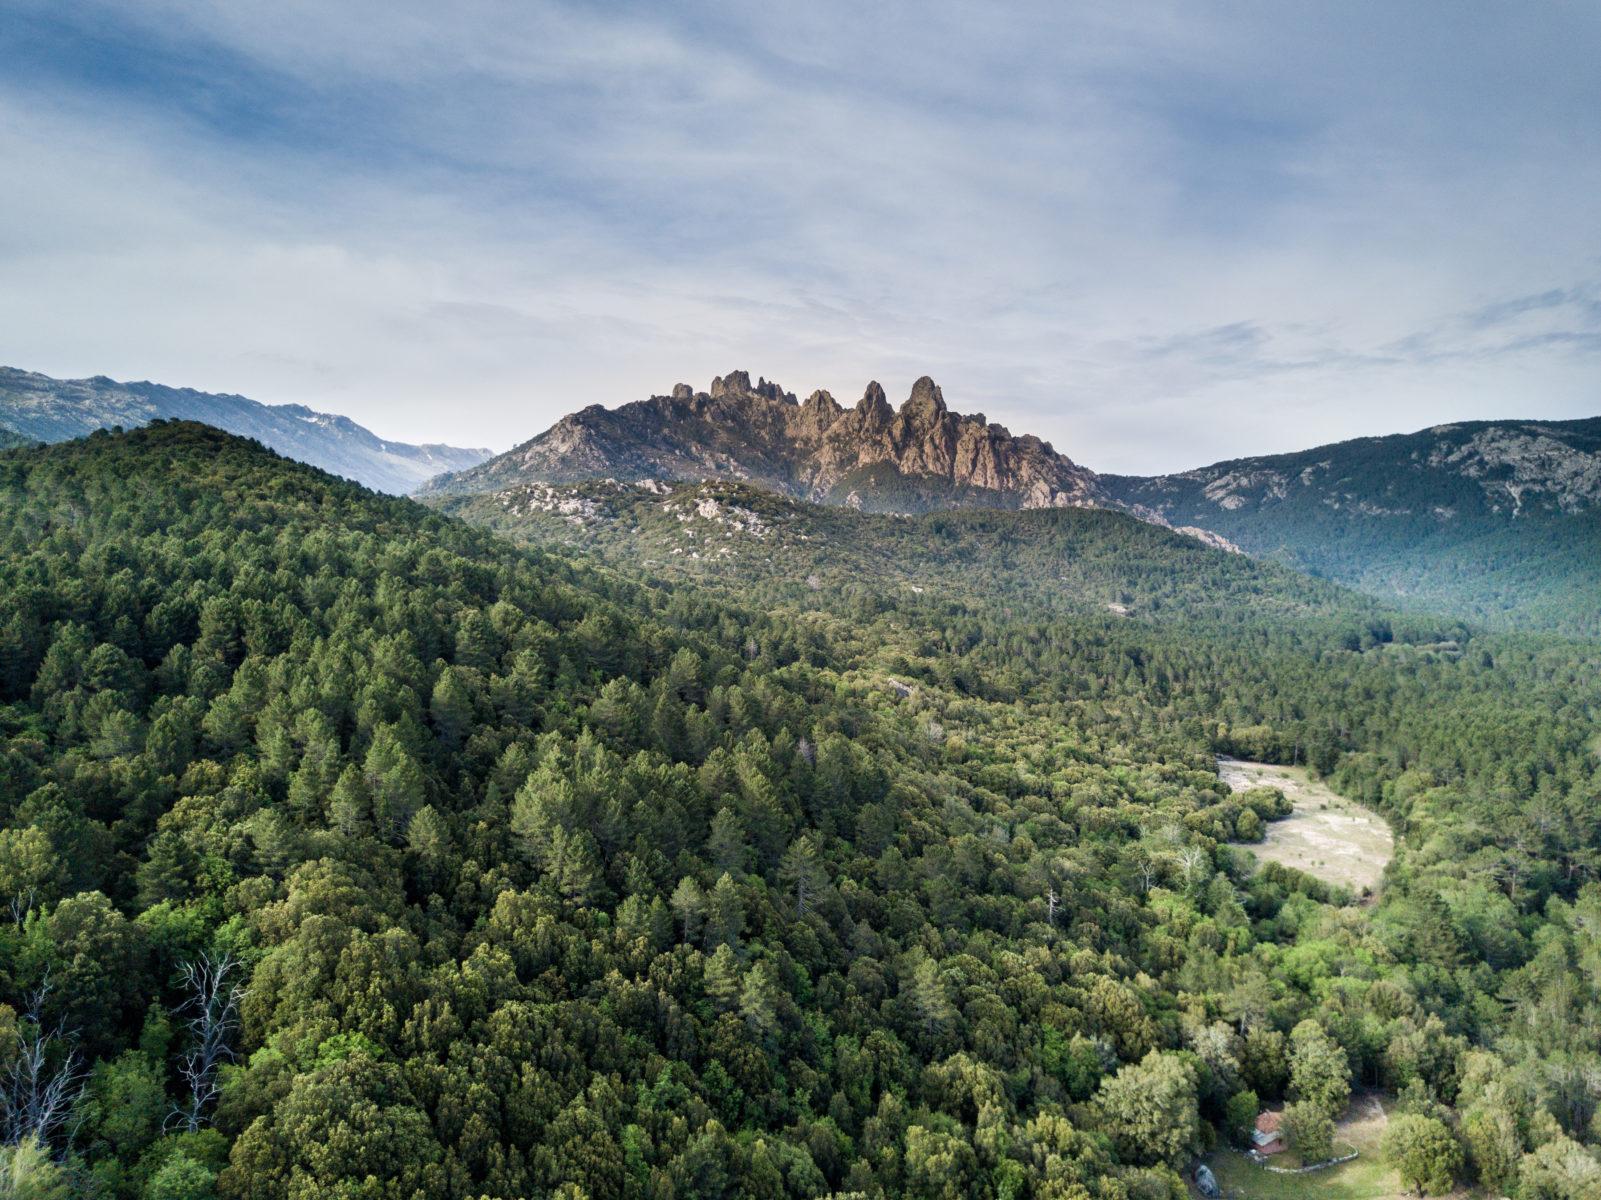 montagnes corses dans l alta rocca